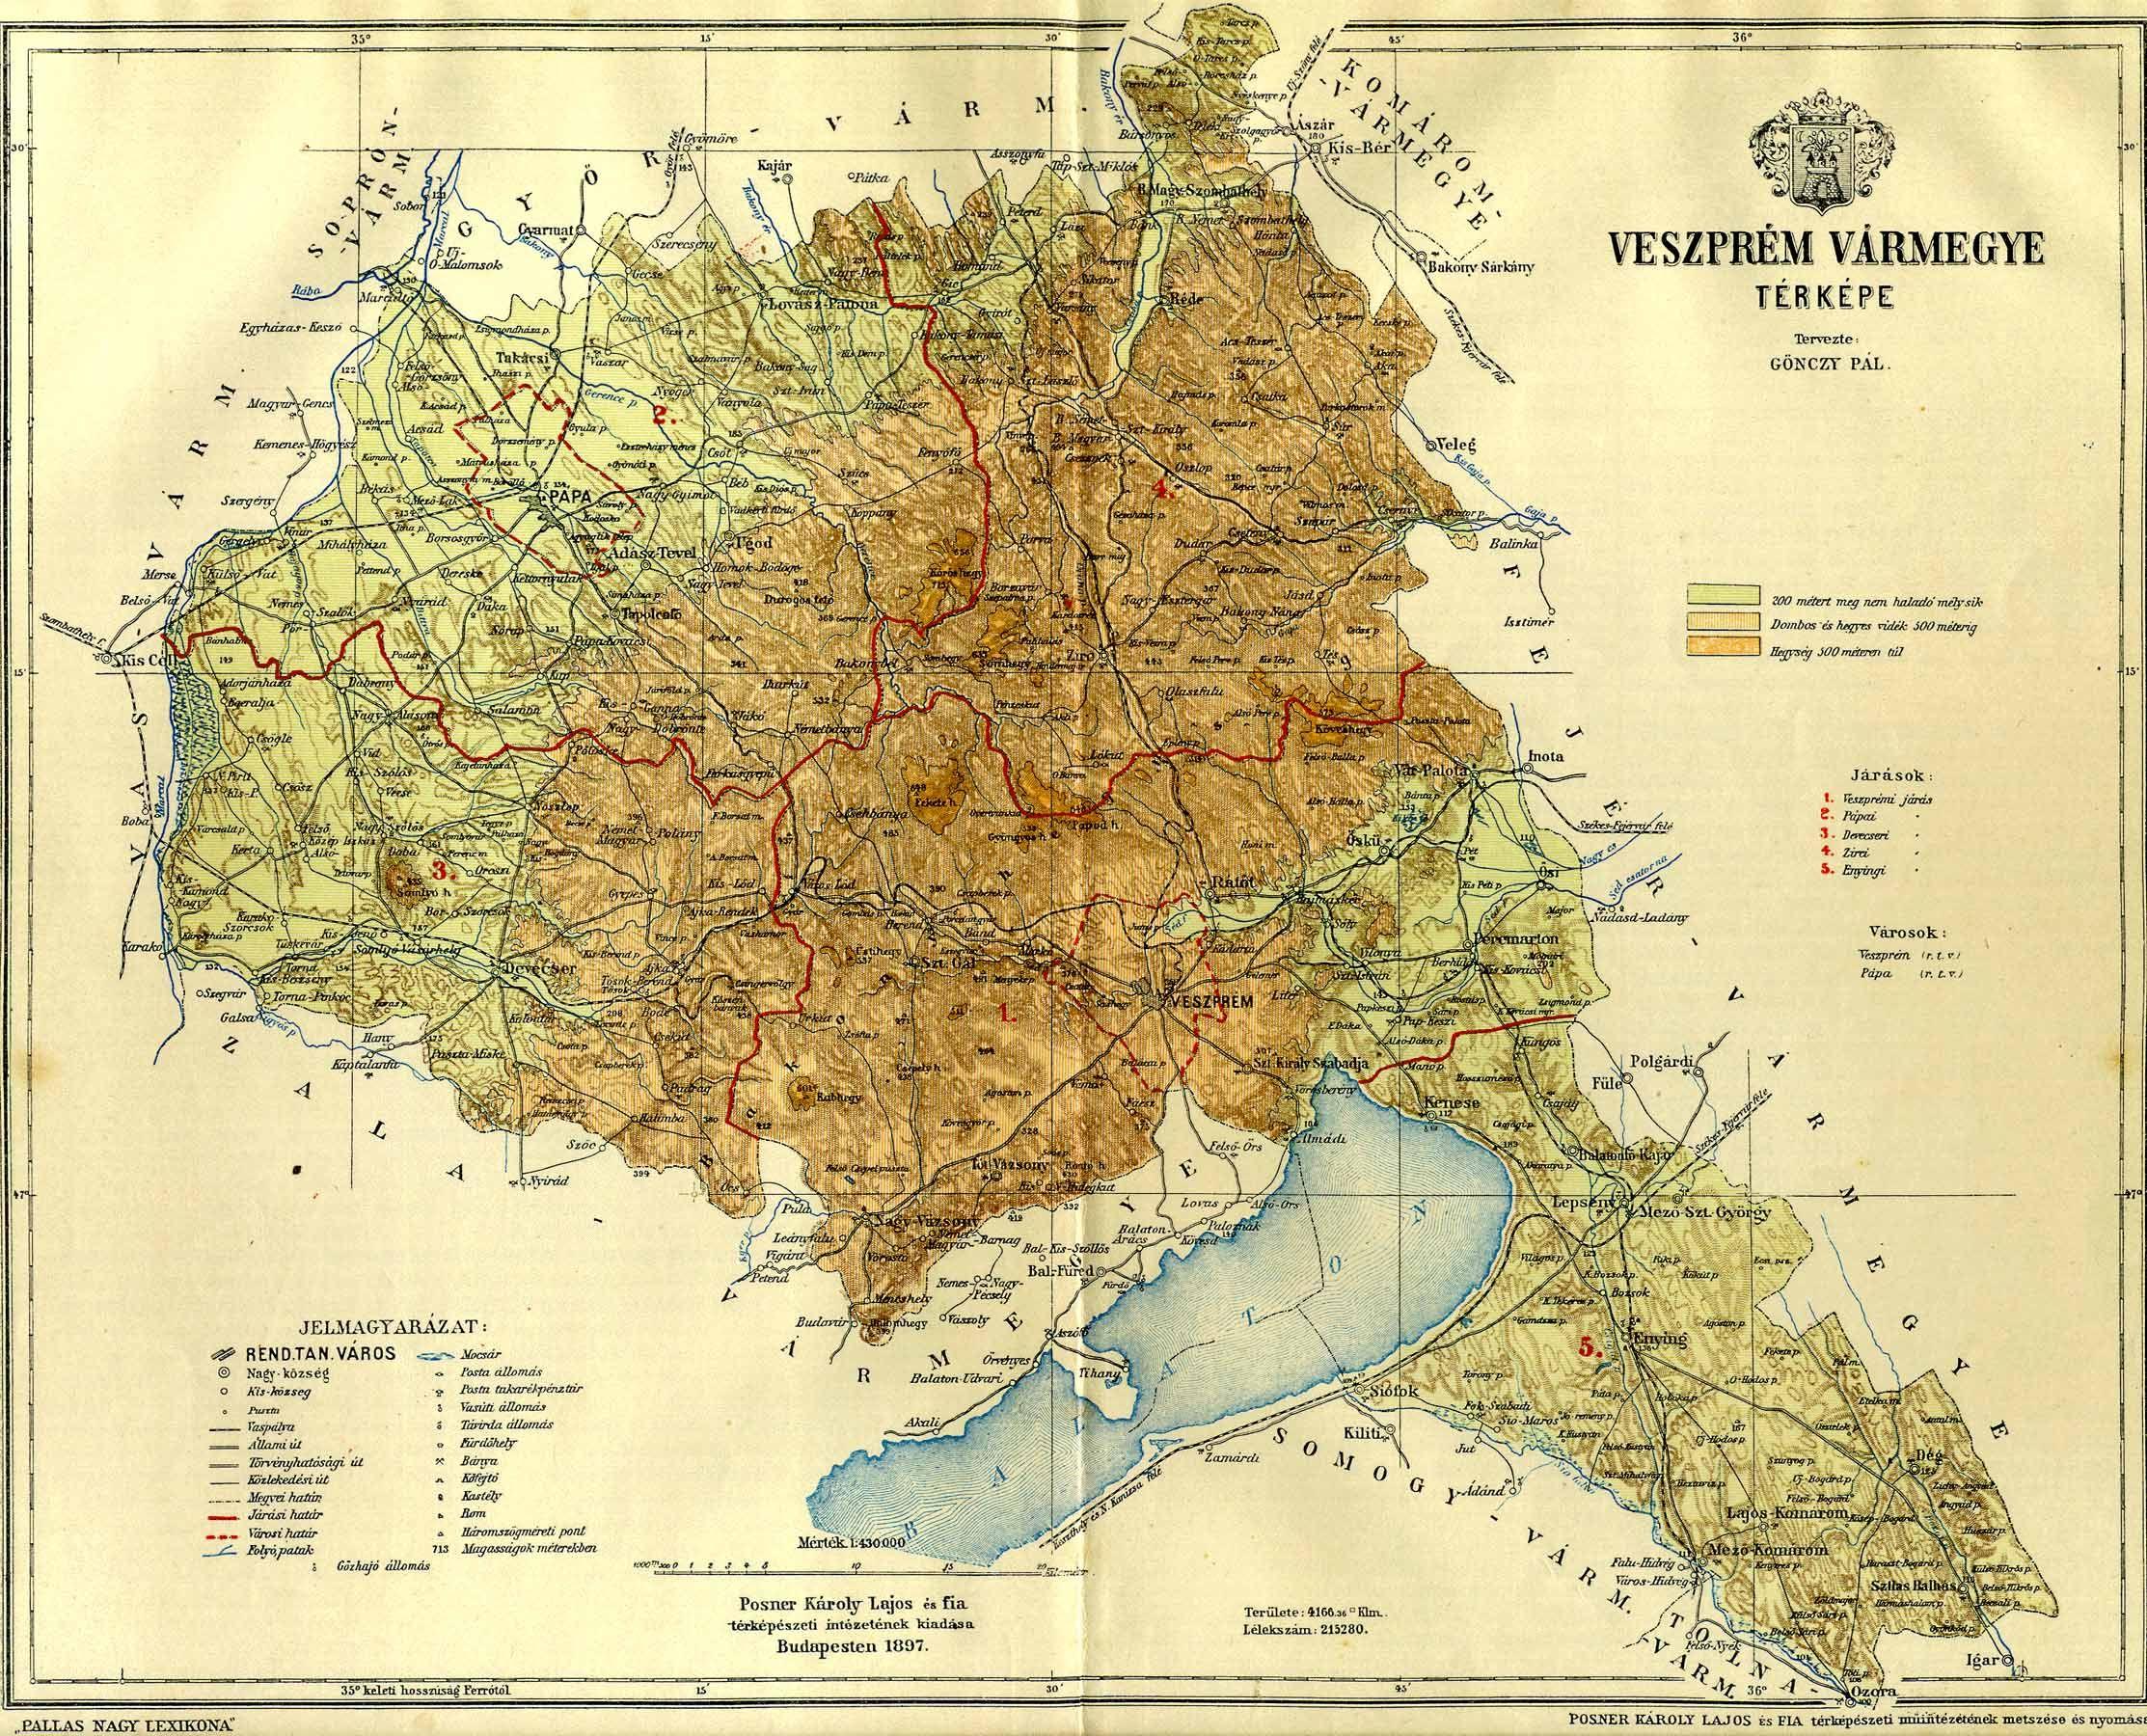 Veszprem Varmegye Terkepe Digitalis Keparchivum Dka 000679